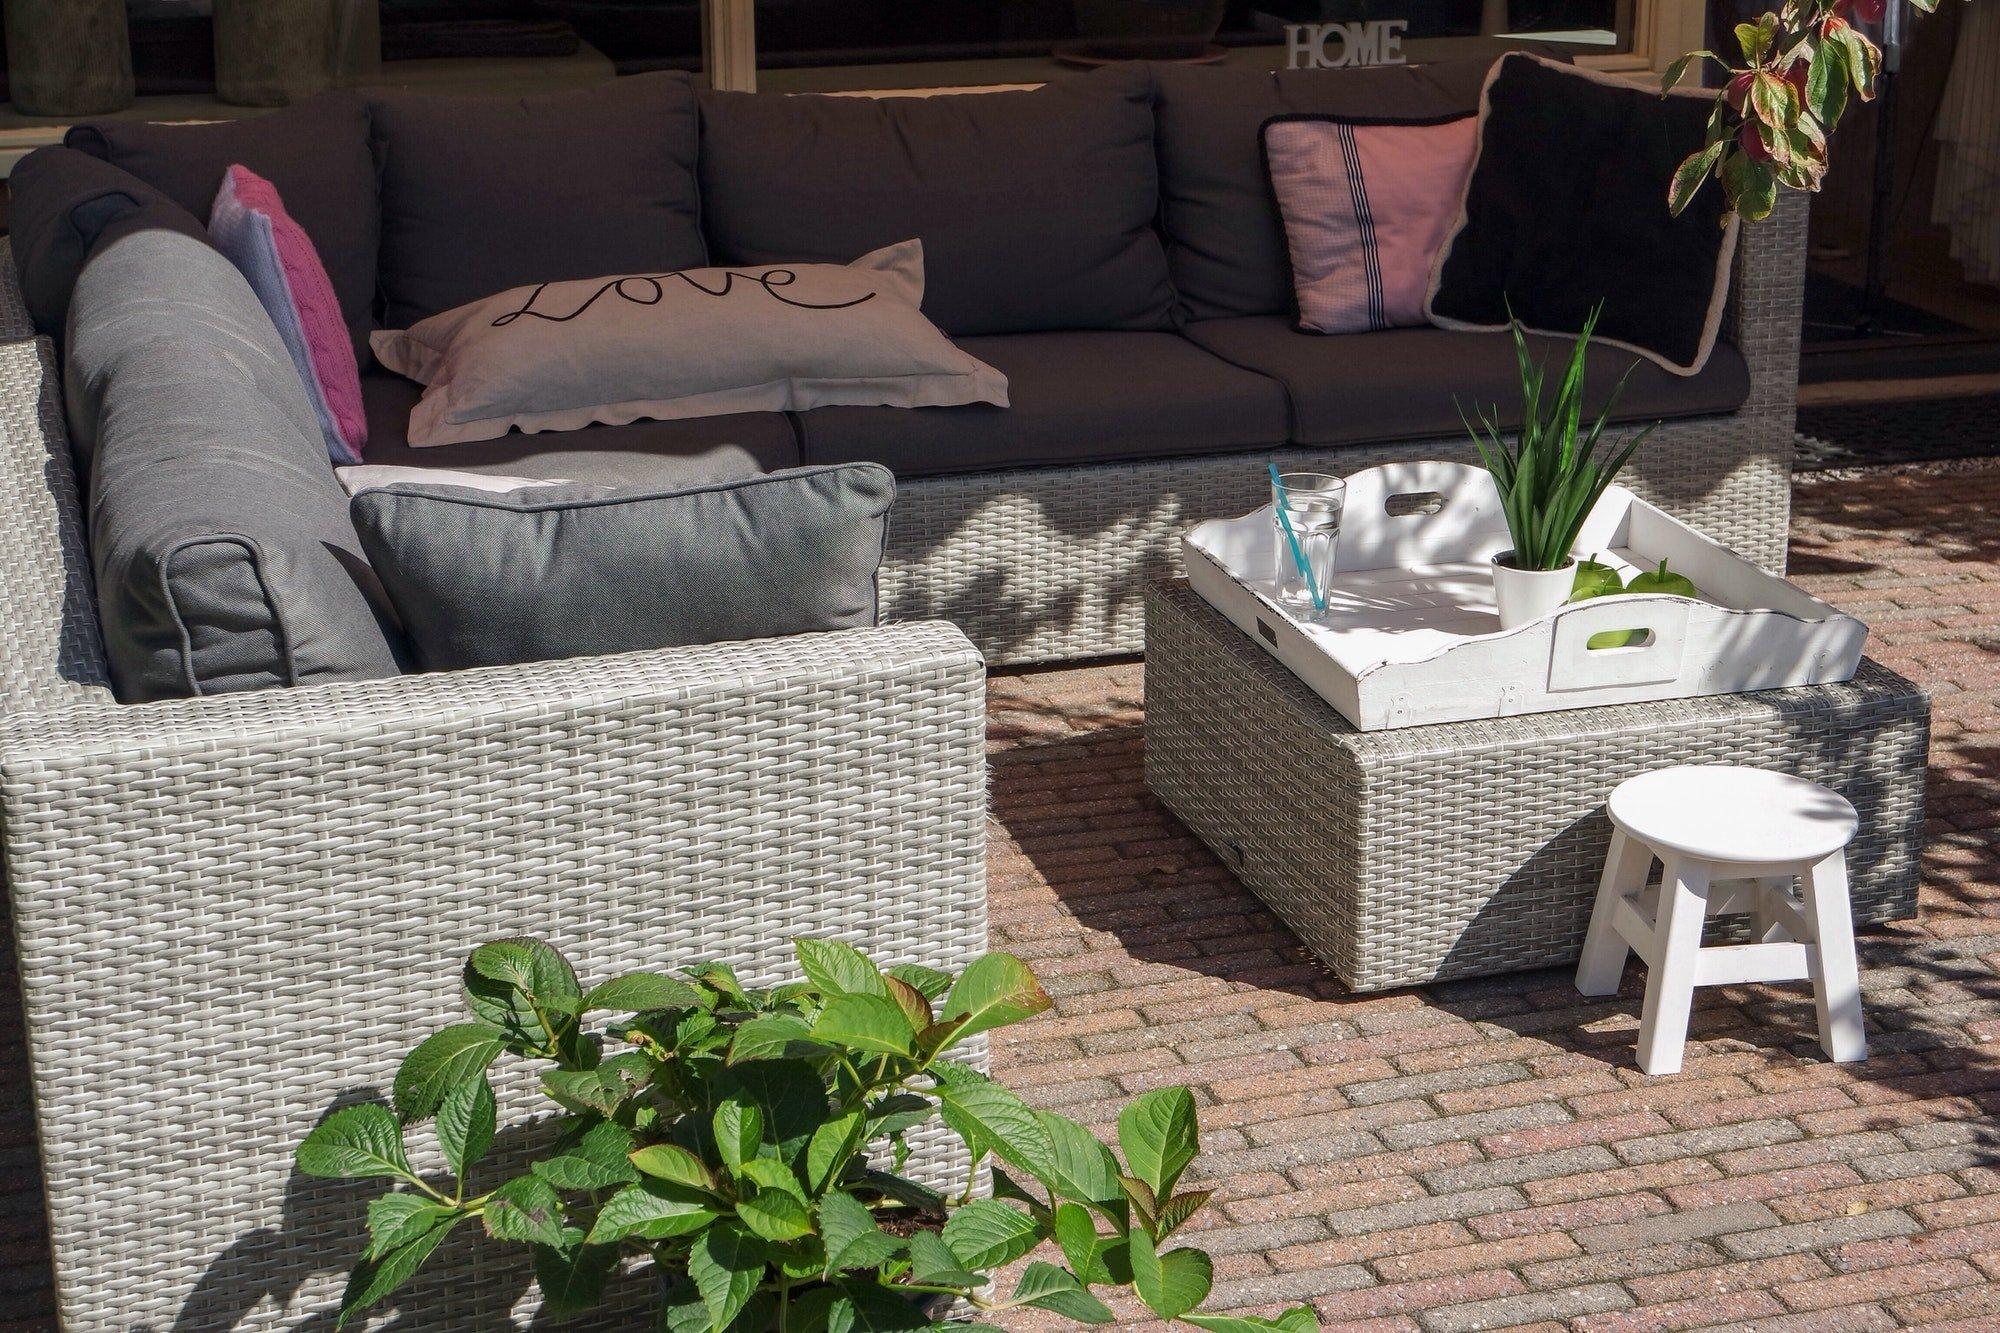 Outdoor furniture. Outdoor living space.